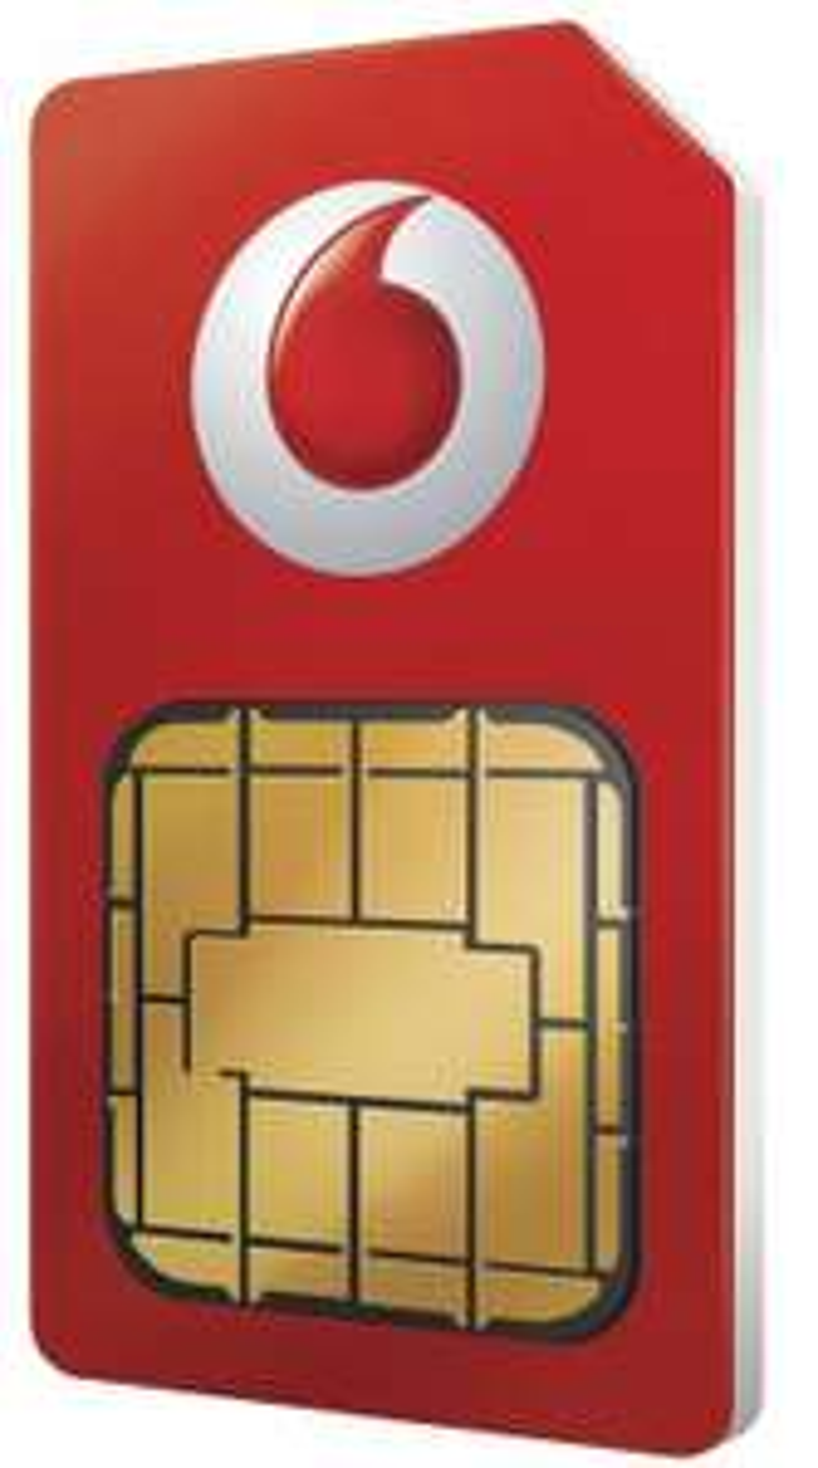 Vodafone 5G Sim Only 100GB, Unltd Mins/Texts 12m - £16pm + £40 auto-cashback + £25 prepaid mastercard @ Mobiles.co.uk